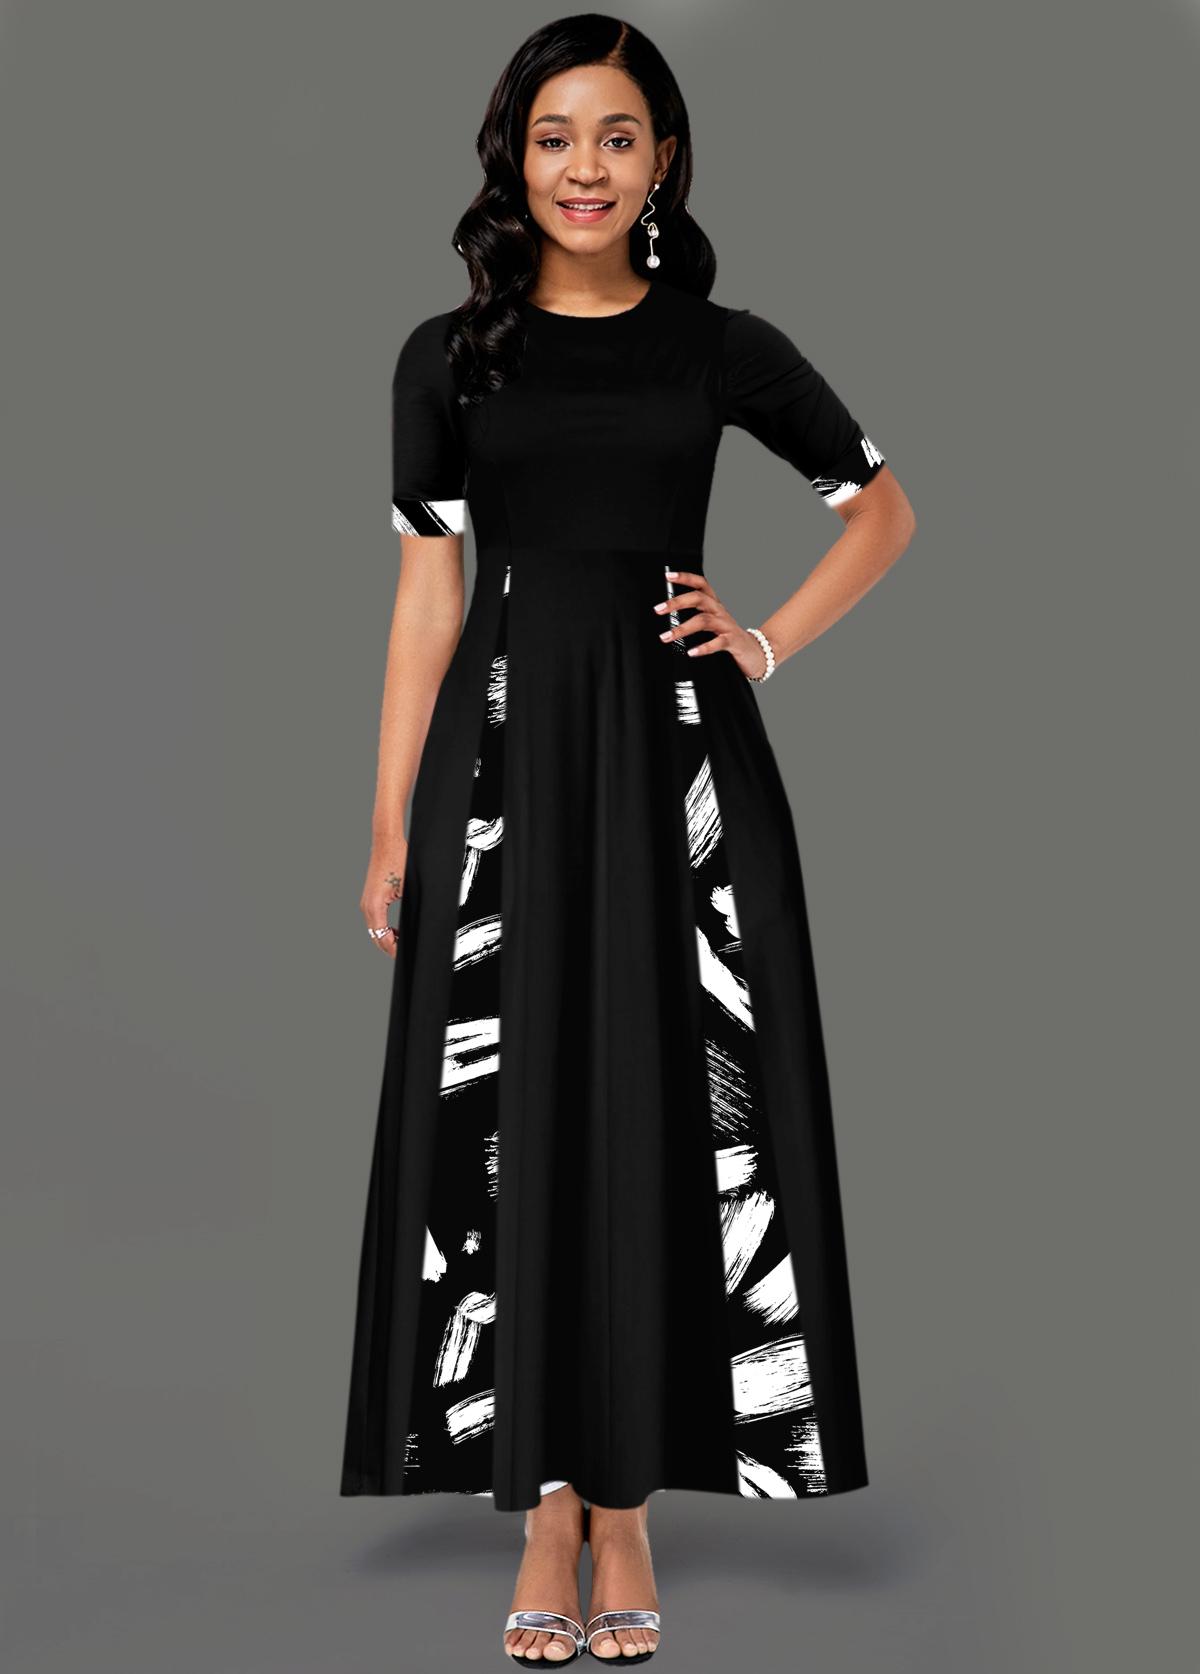 Round Neck Short Sleeve Pocket Printed Dress